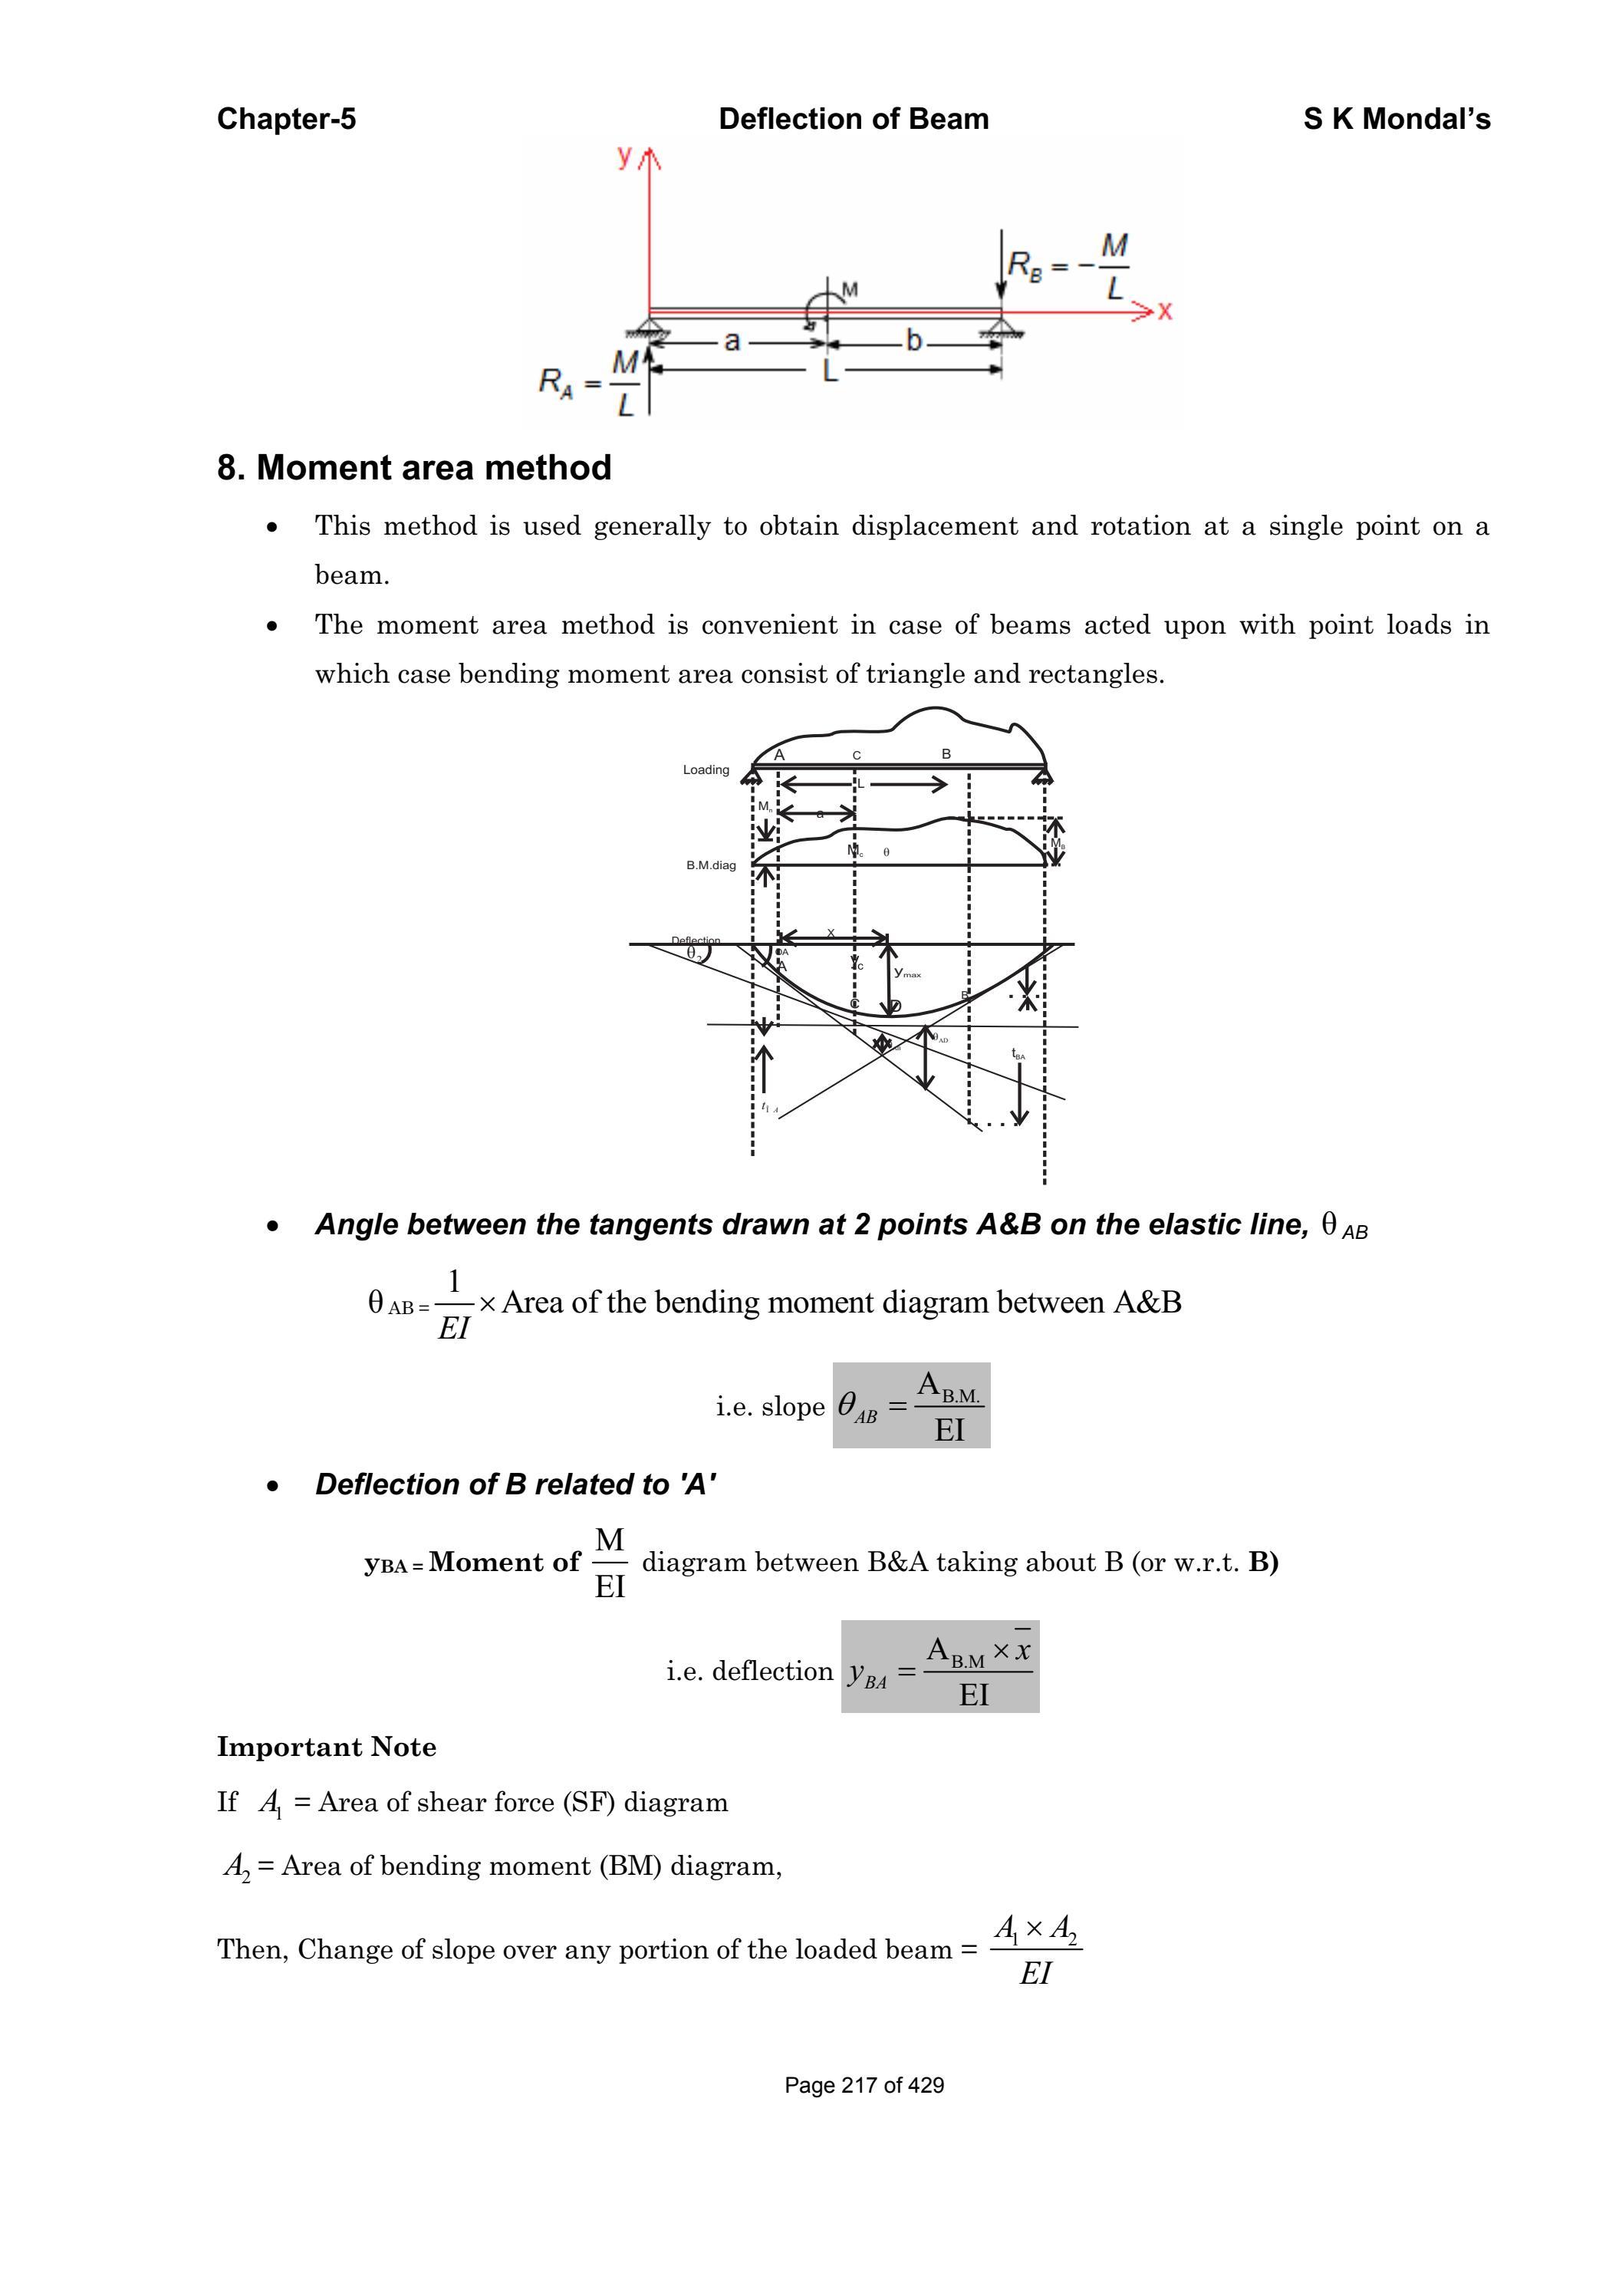 Strength Of Materials By S K Mondal Pdf Sdharmaraj Issuu Beam Moment Diagram